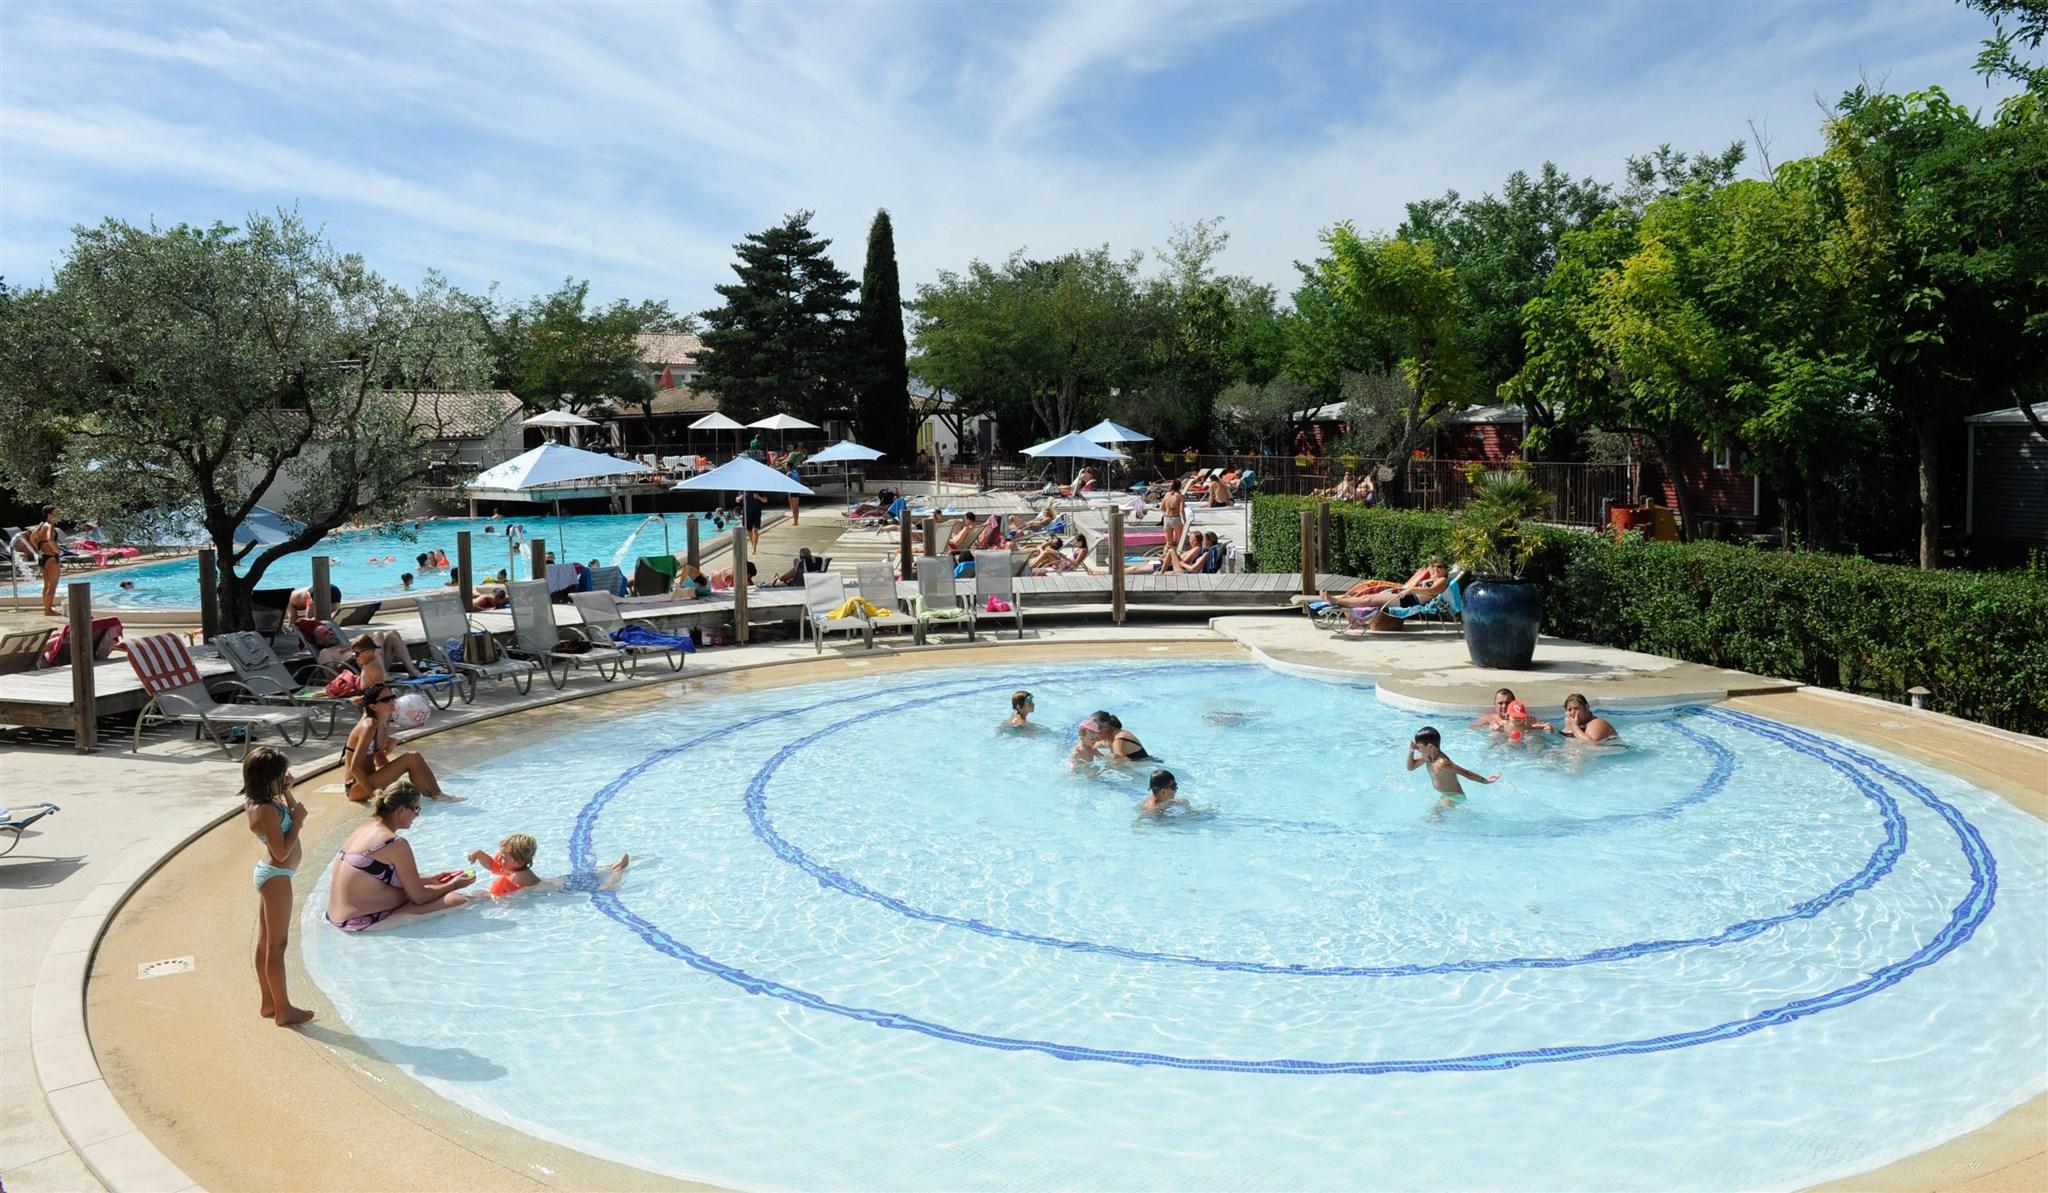 Camping ardeche avec piscine et pataugeoires yelloh for Camping ardeche 2 etoiles avec piscine